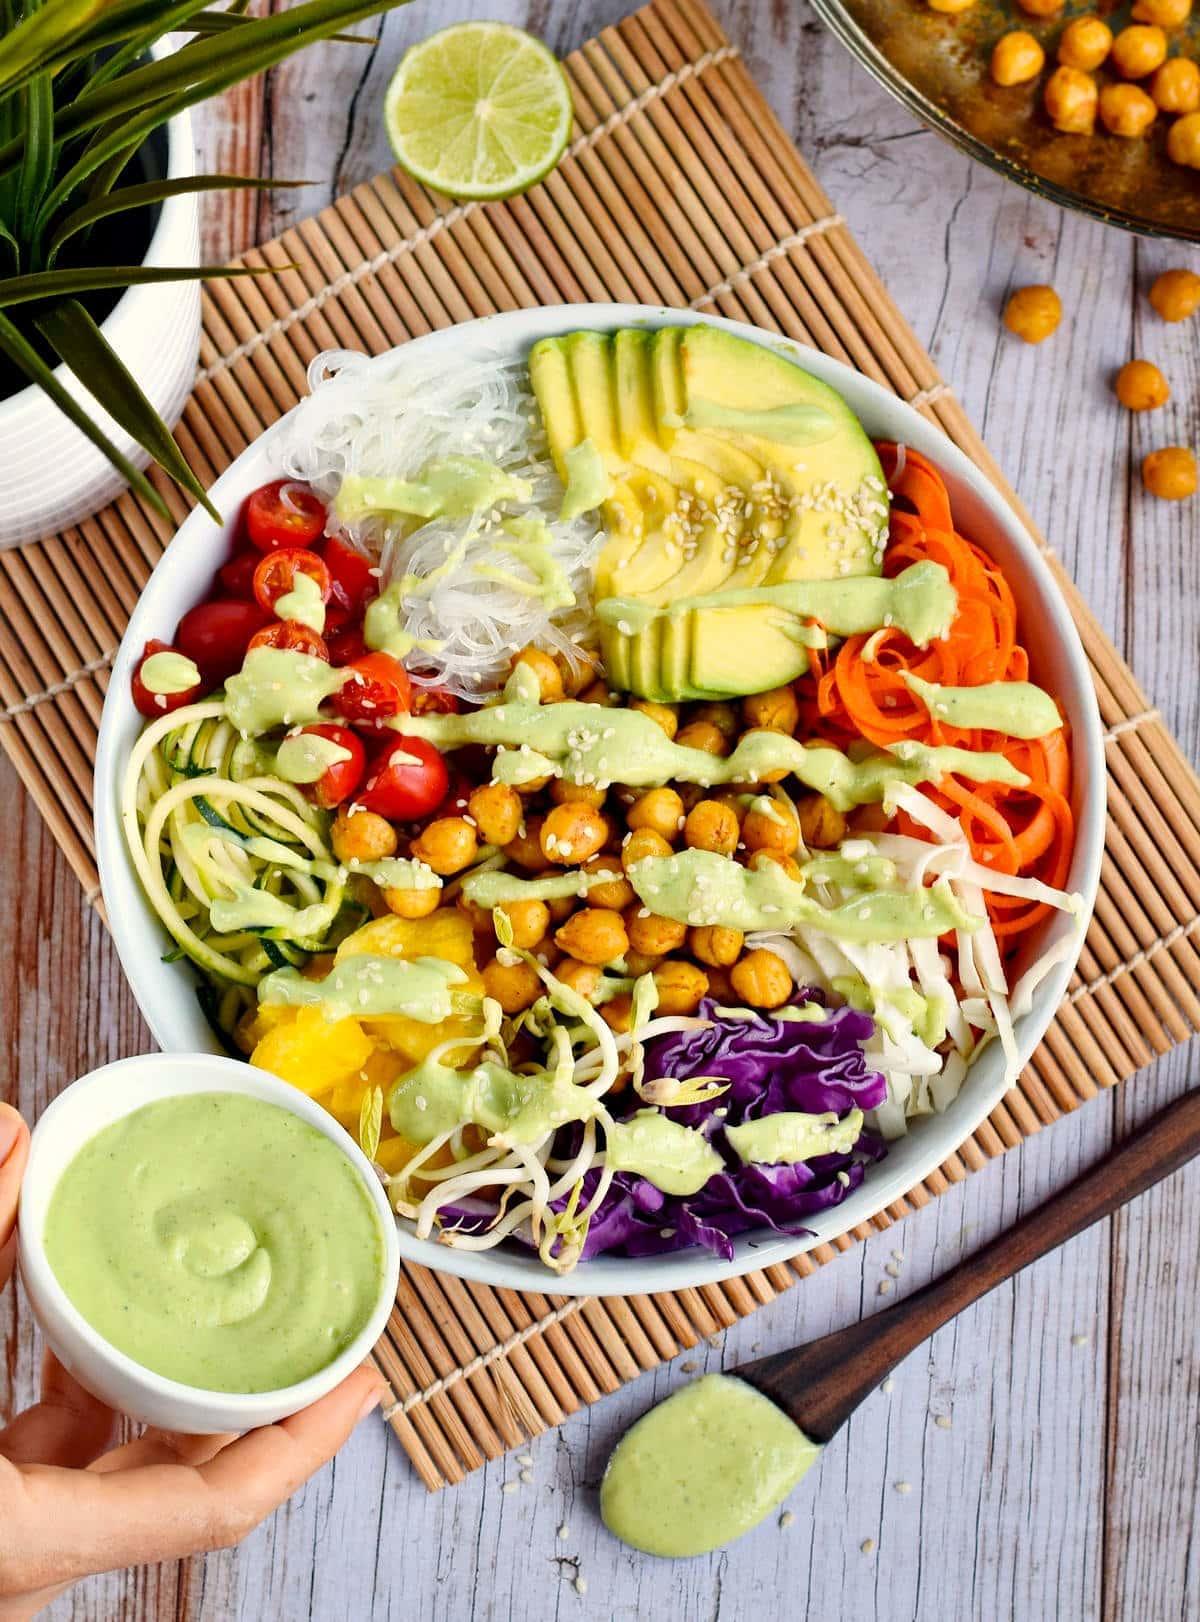 hand pouring green avocado dressing over vegan buddha bowl with chickpeas